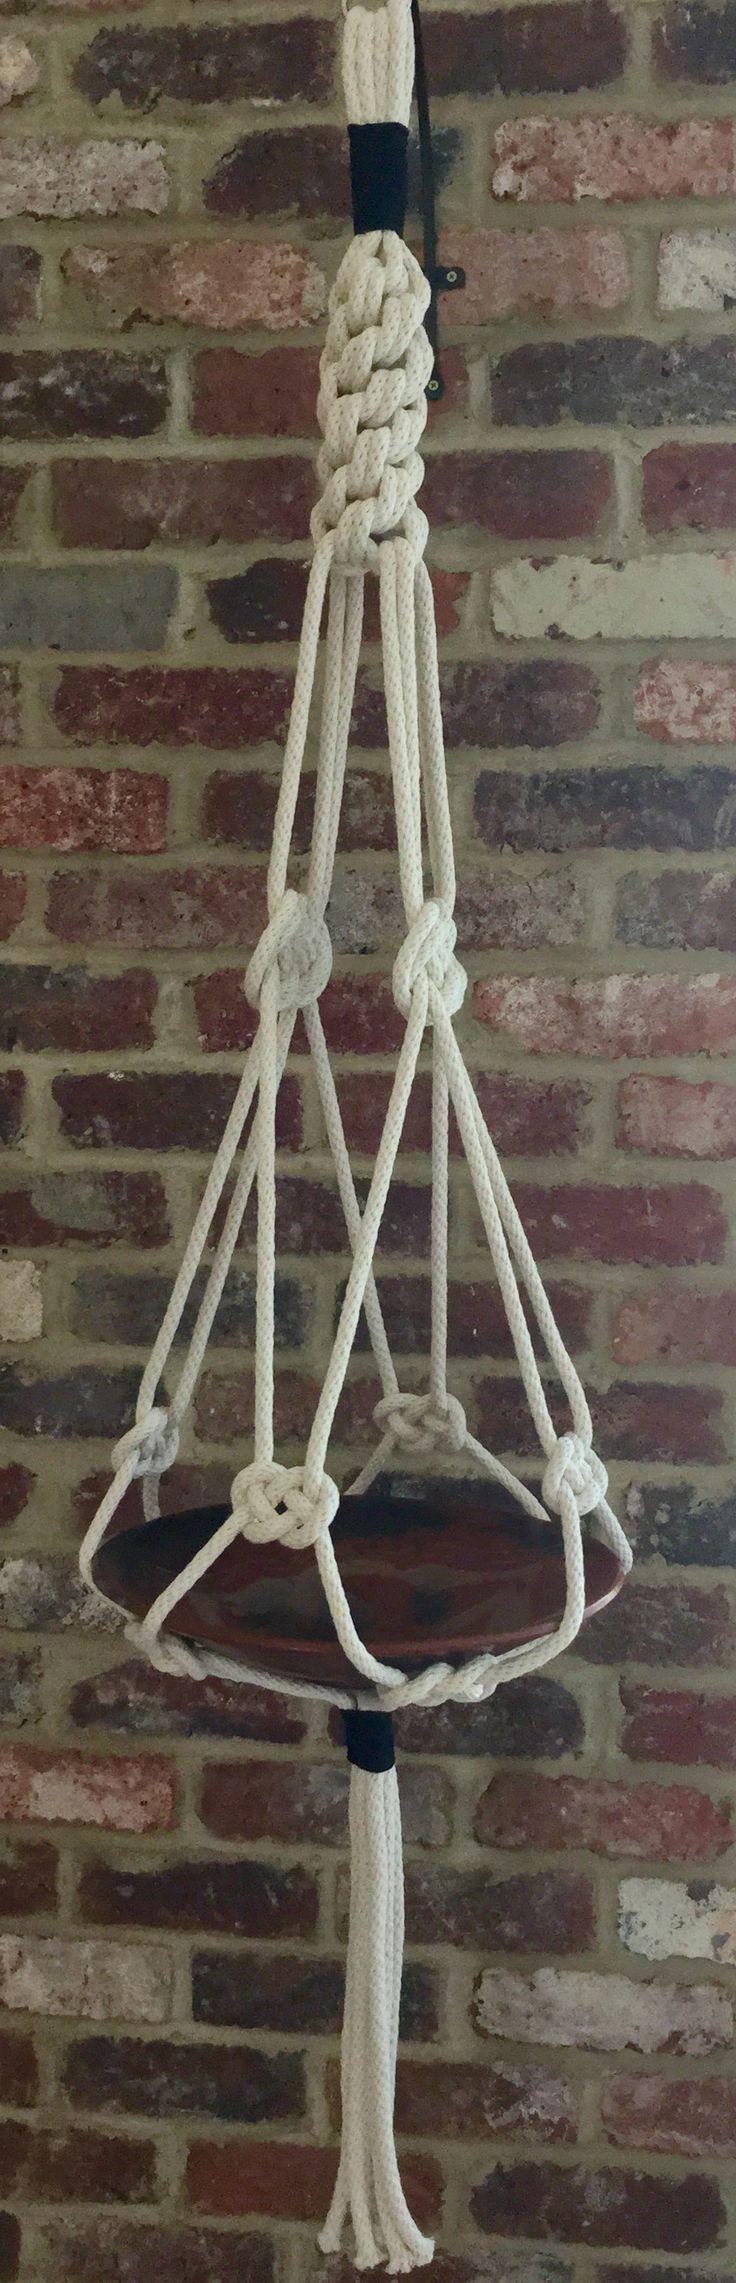 Macrame fruit bowl/plant hanger- Handmade natural cotton macrame. Visit Lorna and Lila on Facebook